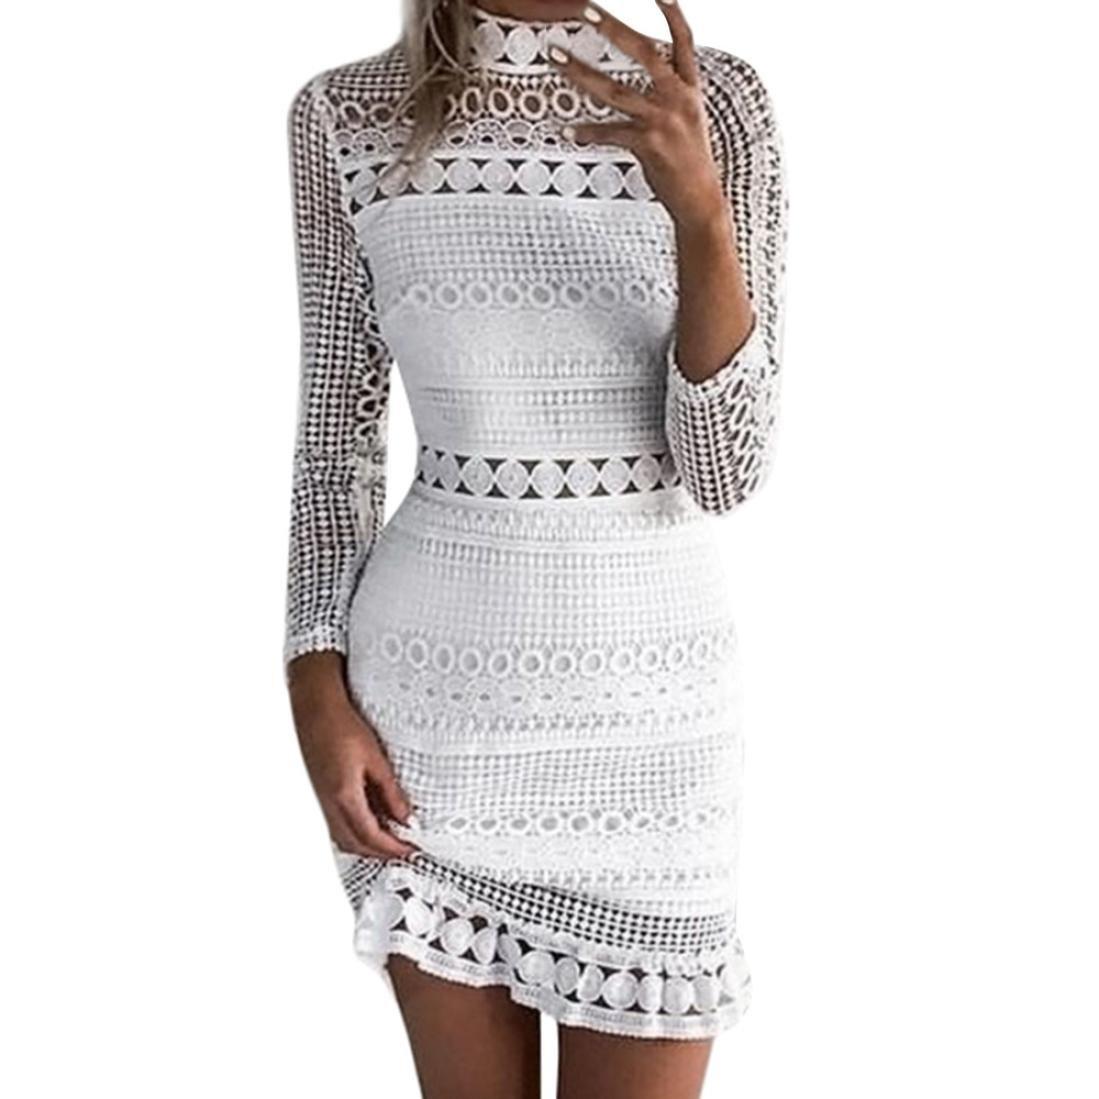 aeb70a890ee6c Leedford 2018 Dress, New Summer White Midi Dress Womens Sexy Lace ...